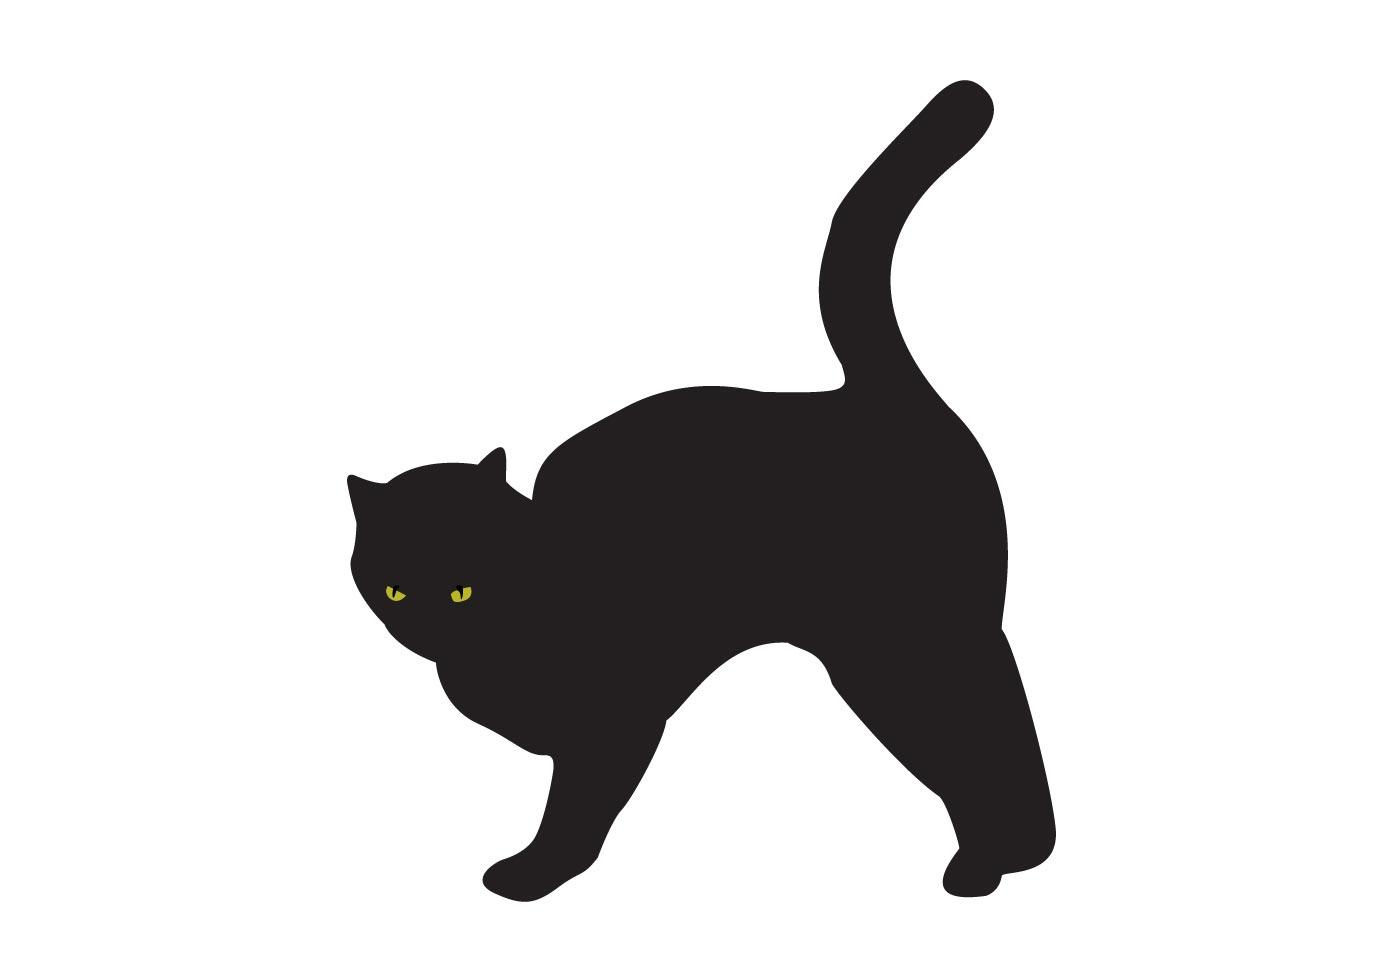 1400x980 Black Cat Silhouette Free Vector Art